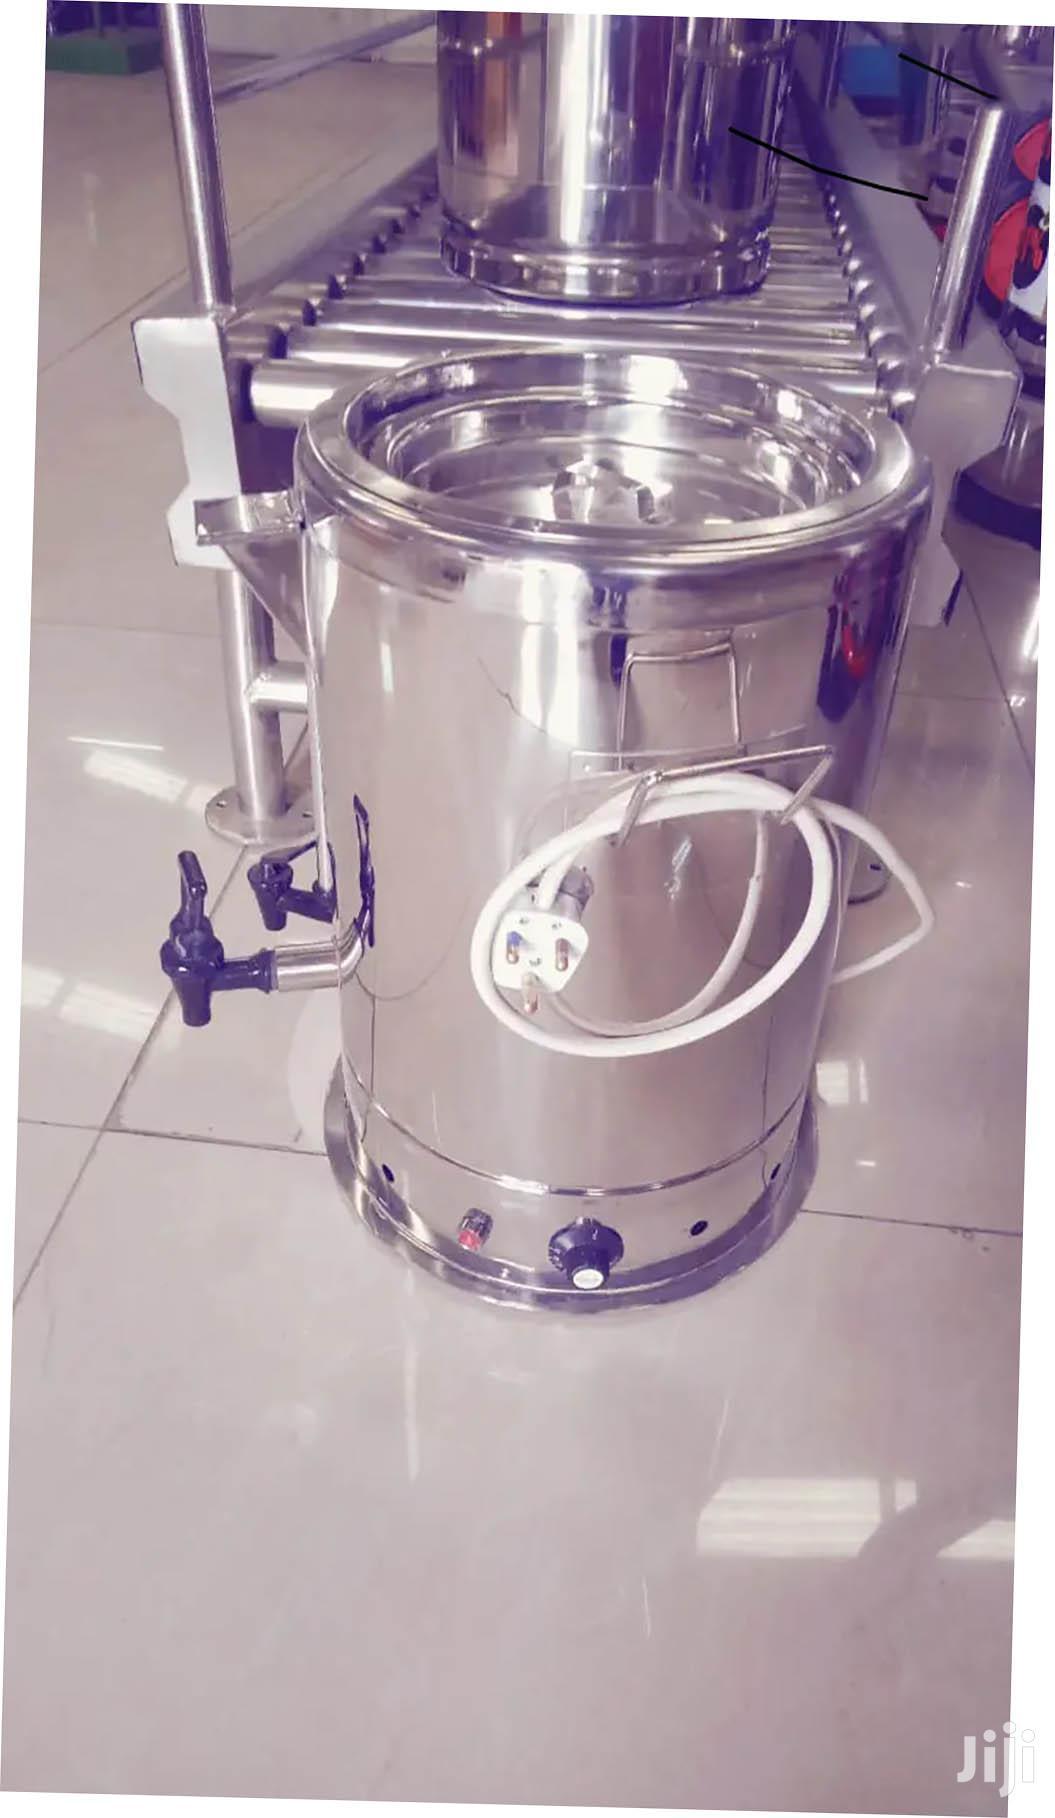 Electrical Milk Boilers/ Pasteurizer